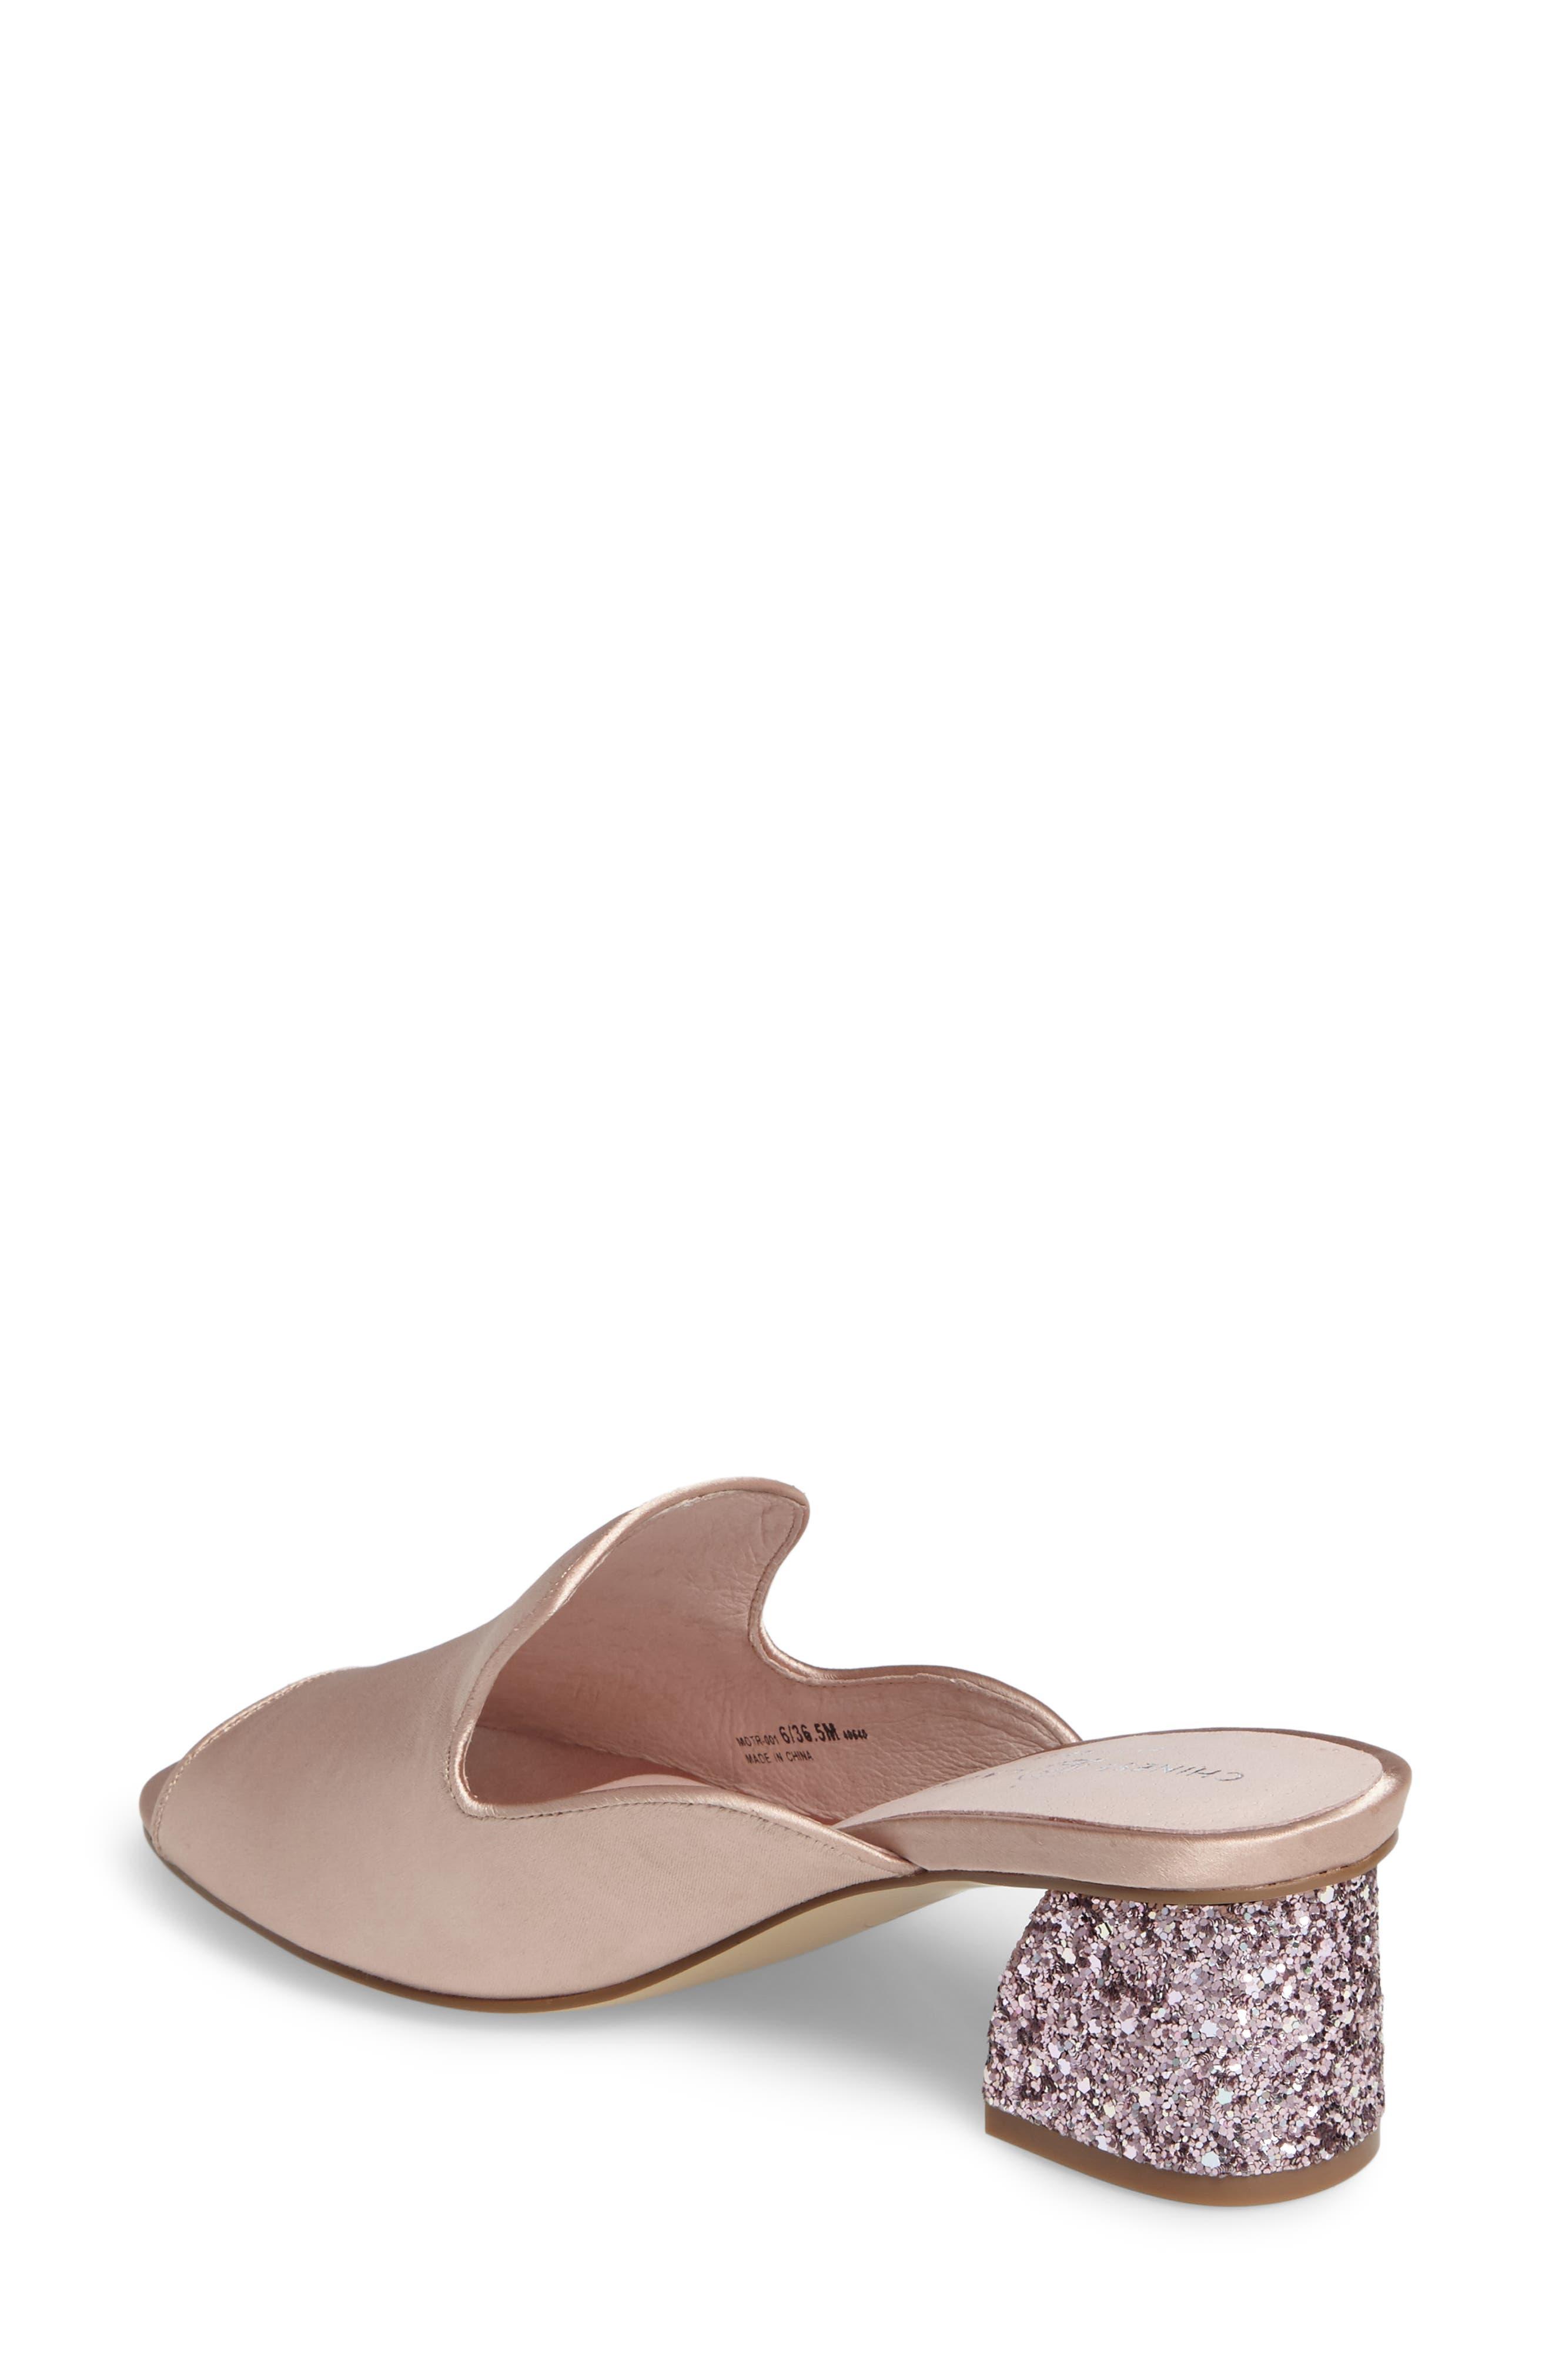 Alternate Image 2  - Chinese Laundry Mara Glitter Loafer Mule (Women)